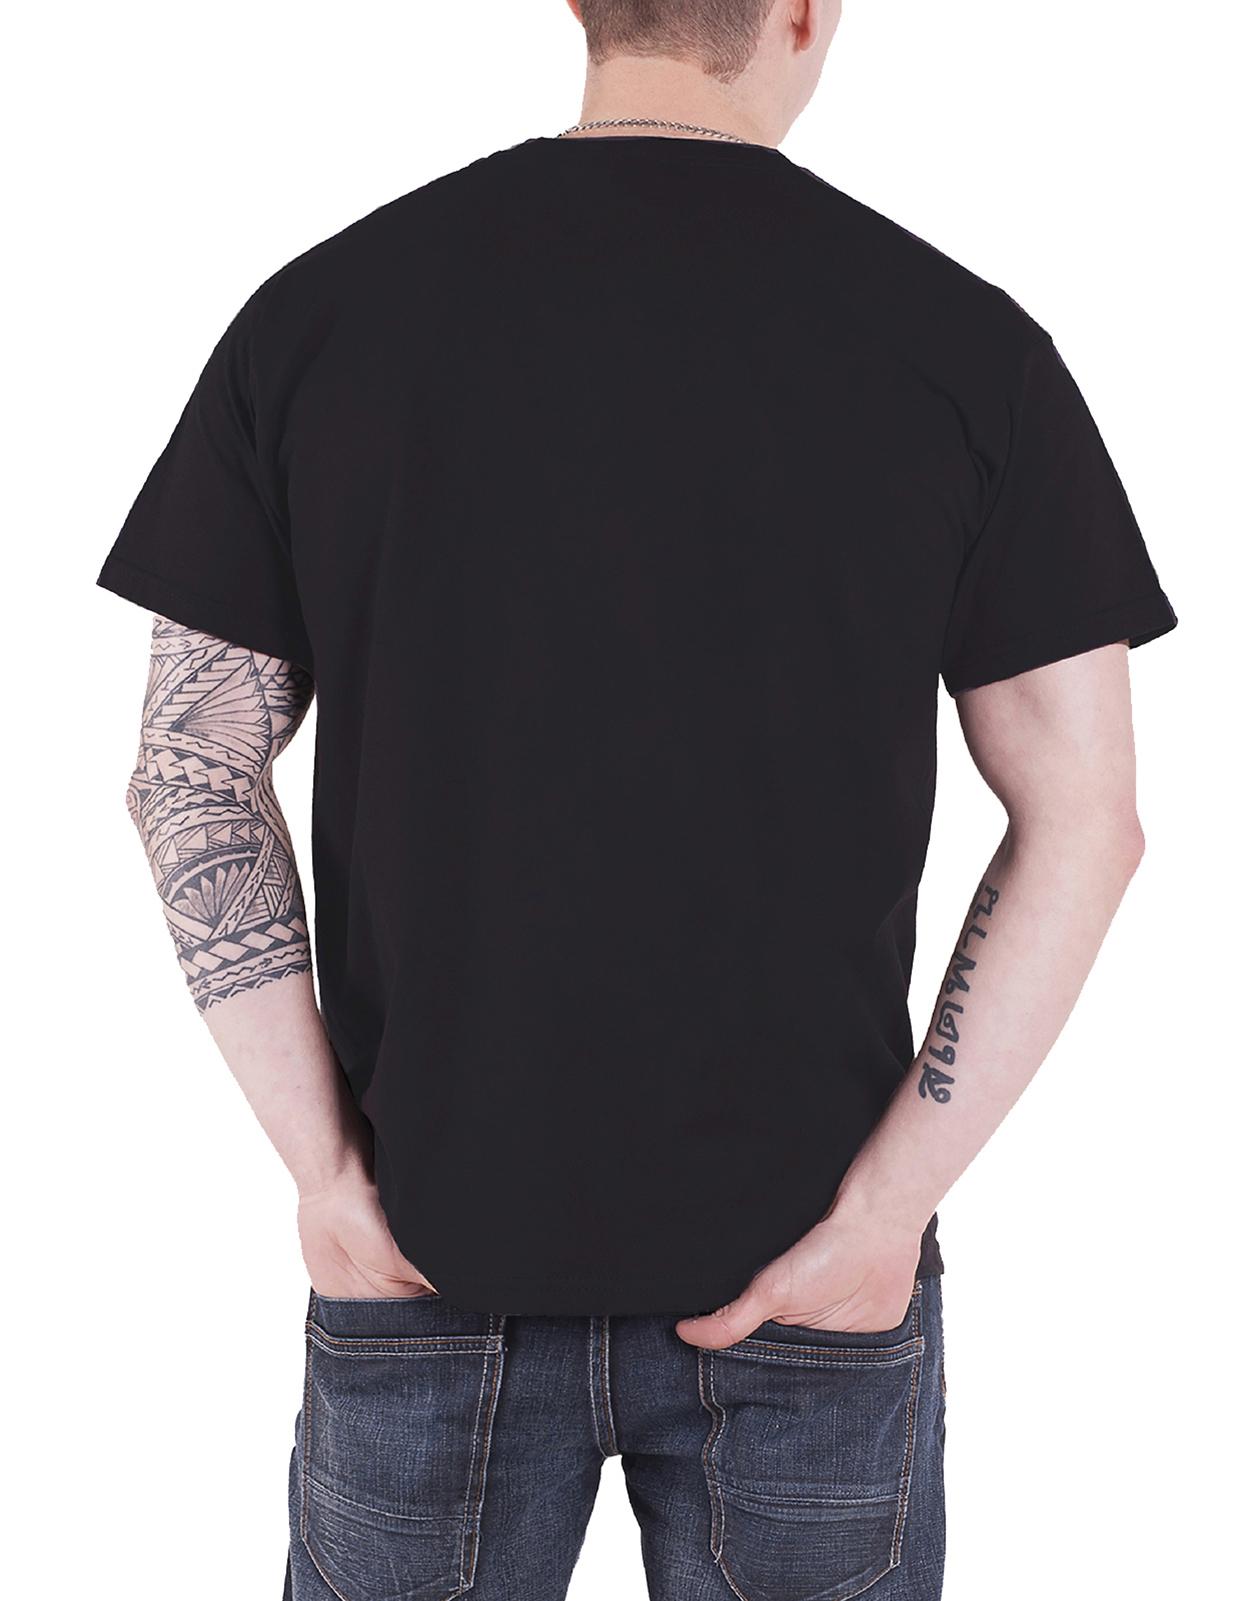 Official-Motley-Crue-T-Shirt-Shout-at-the-Devil-The-Dirt-Tour-Band-Logo-Mens thumbnail 42